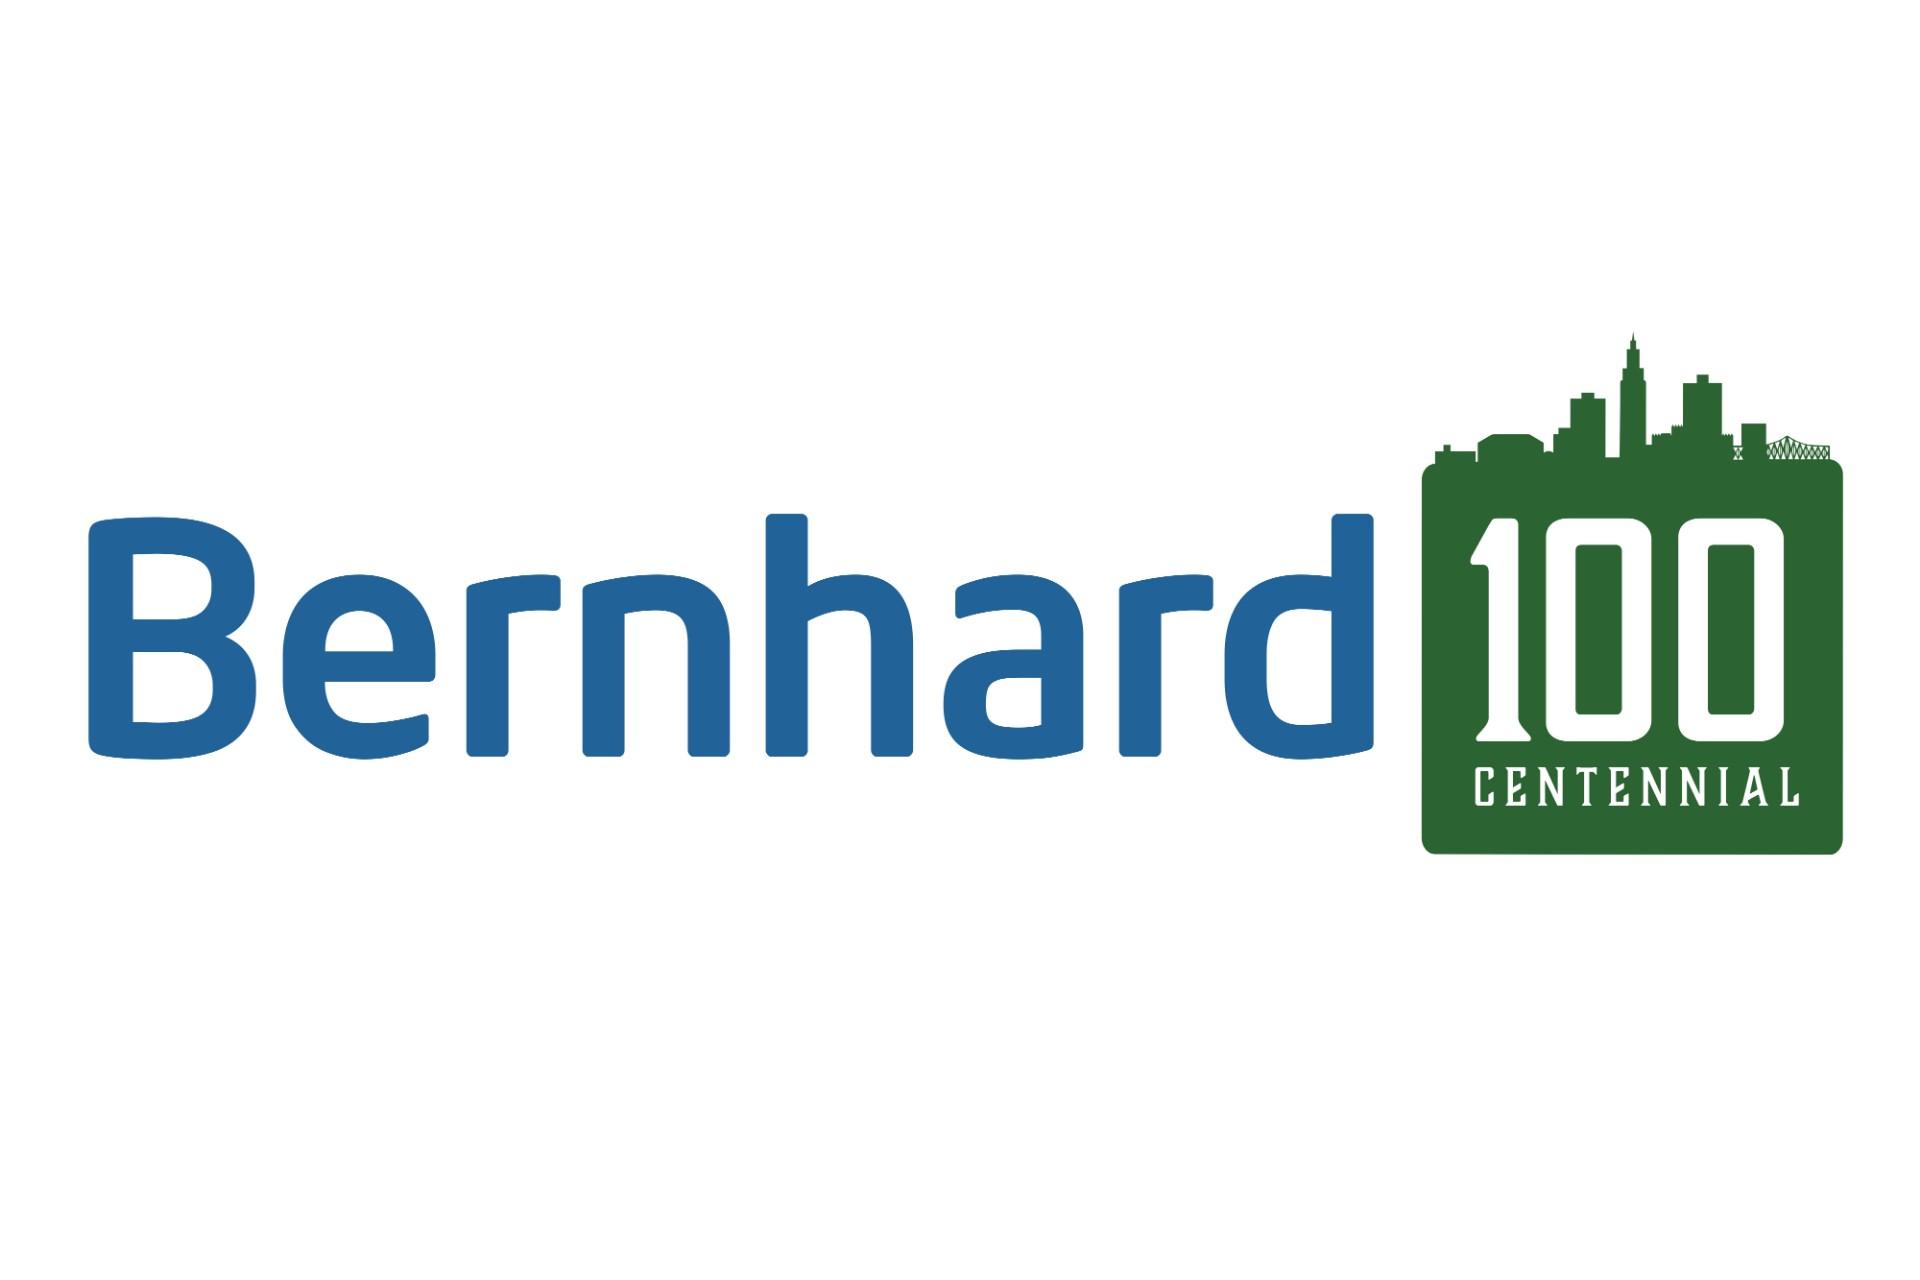 Bernhard 100th Anniversary Logo Design